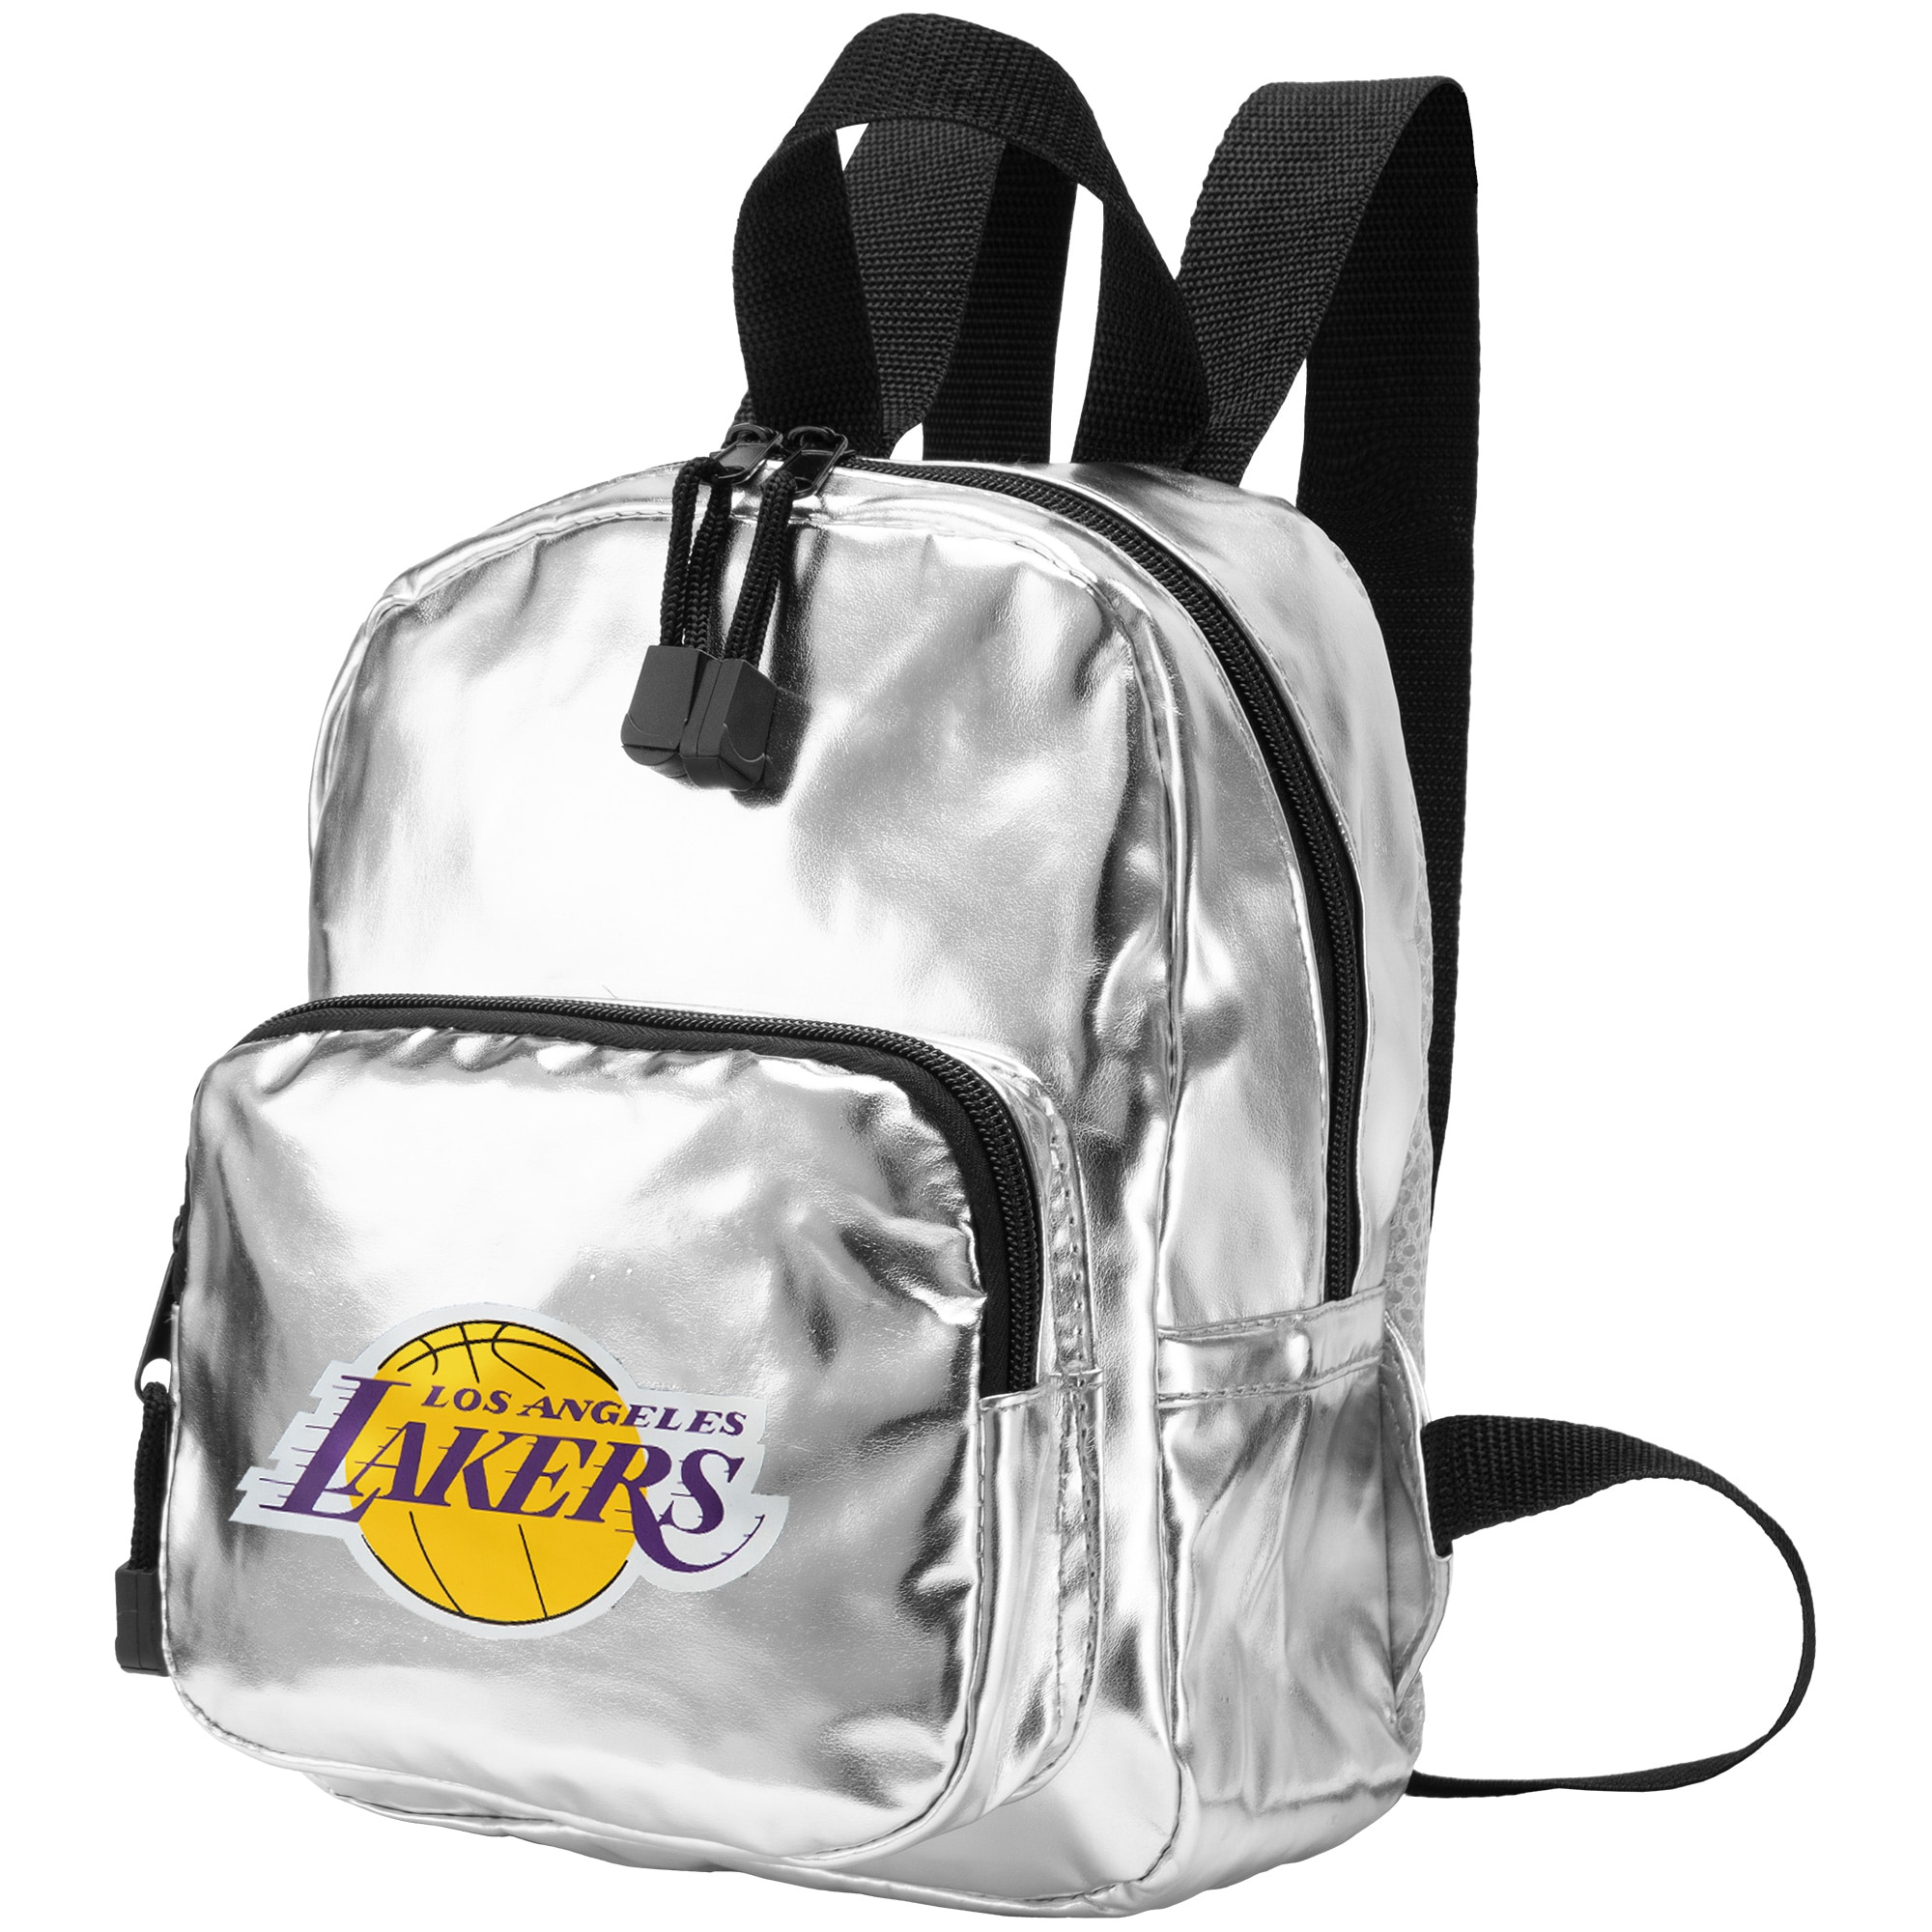 Los Angeles Lakers The Northwest Company Spotlight Mini Backpack